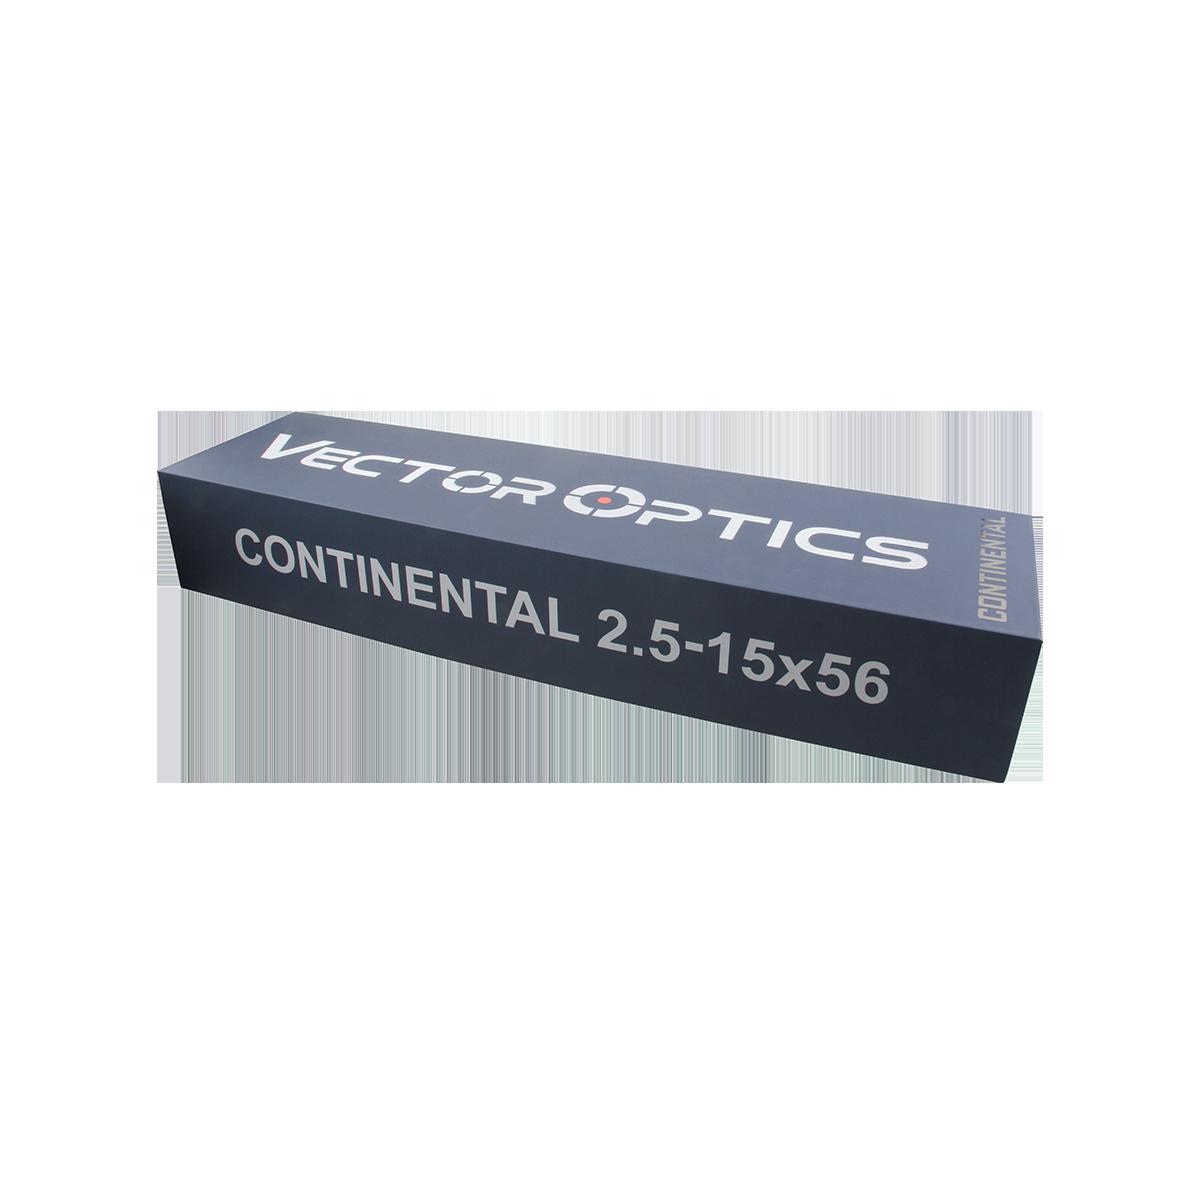 Continental 2.5-15x56 Riflescope BDC